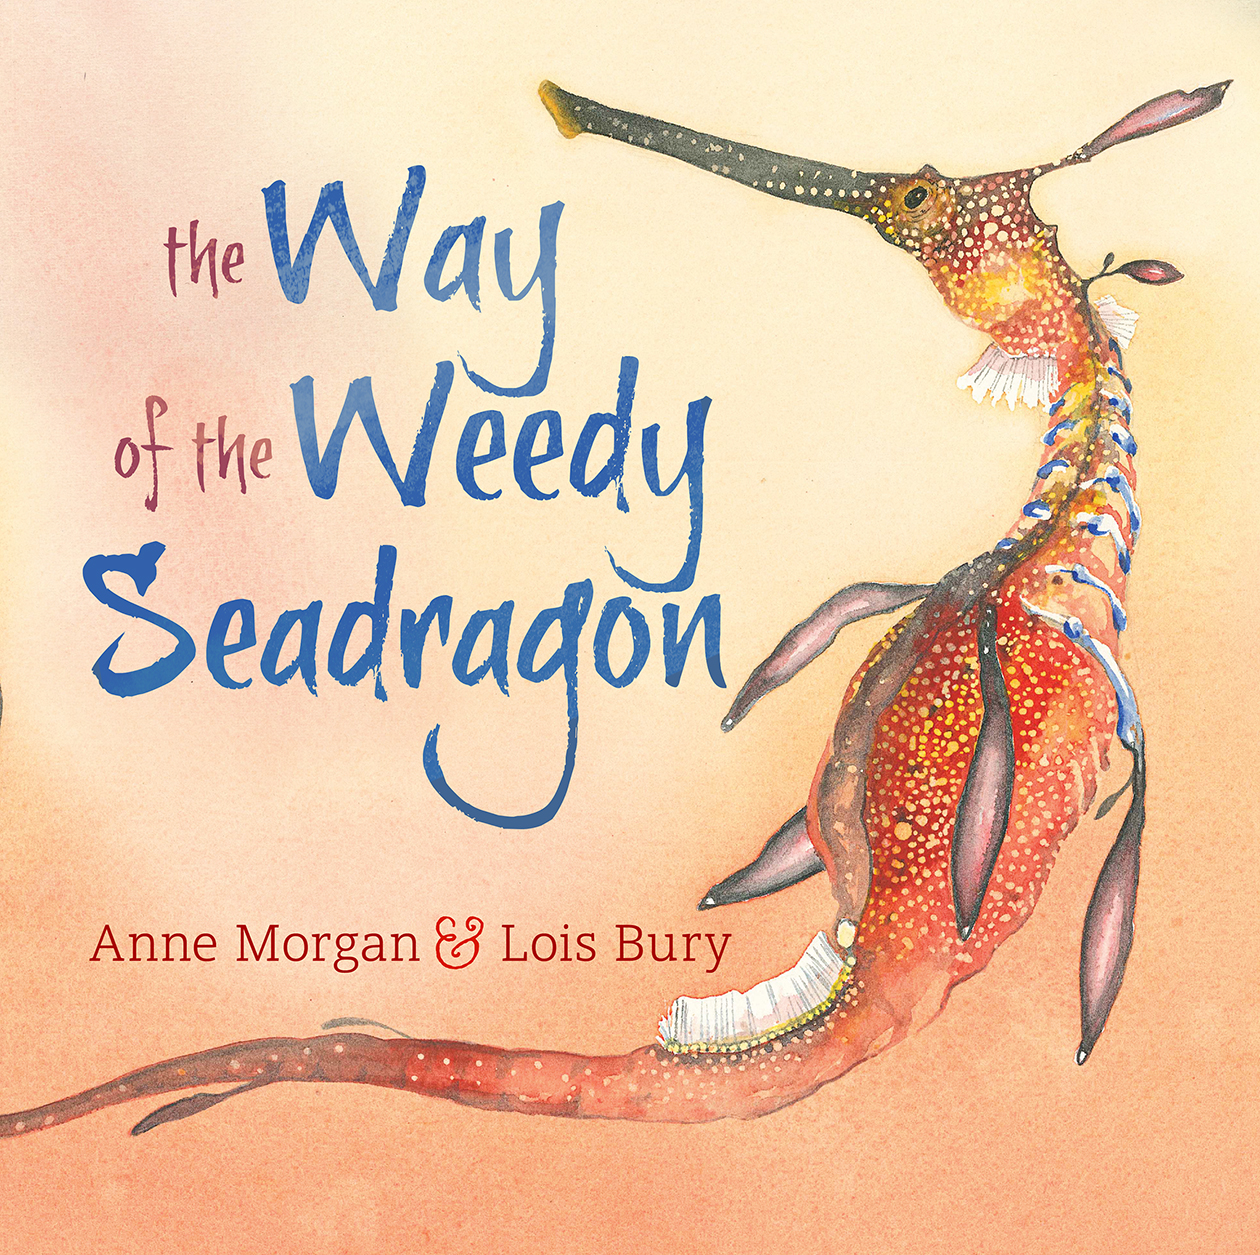 The Way of the Weedy Sea Dragon